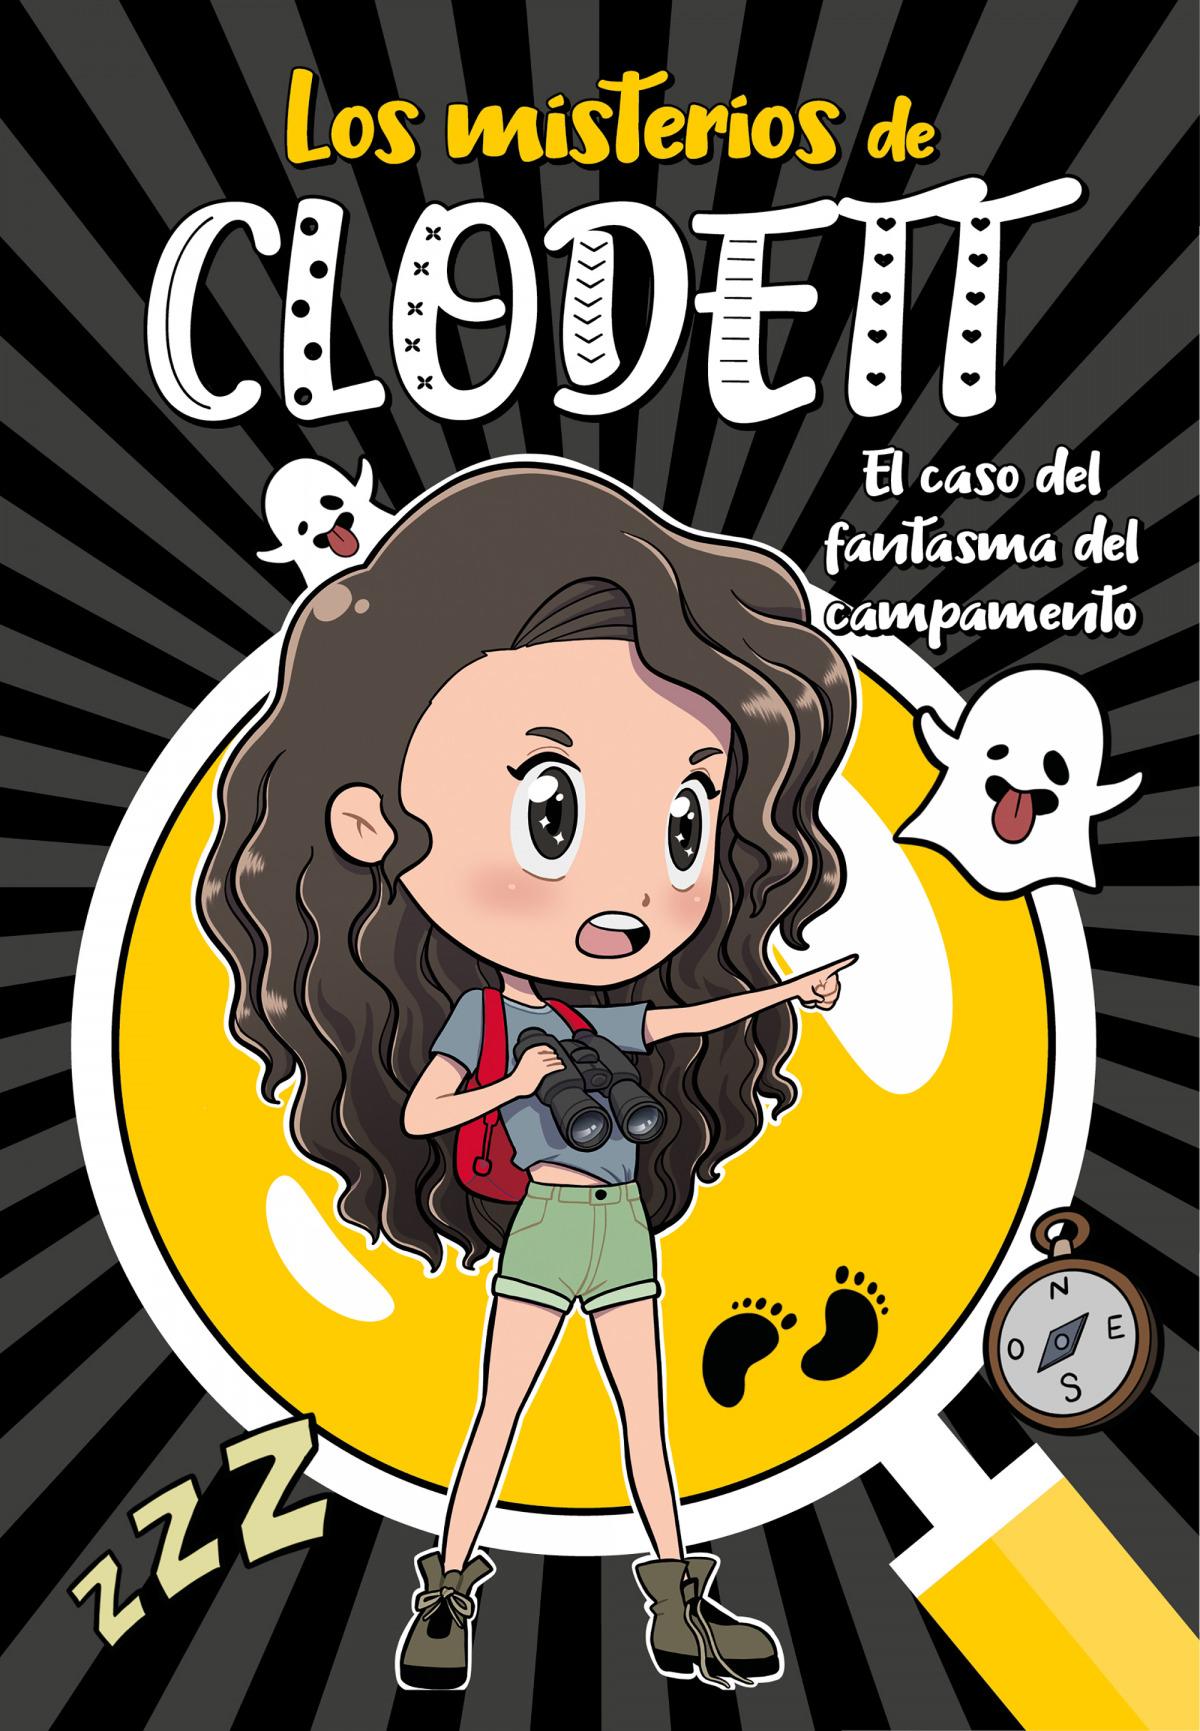 El caso del fantasma del campamento (Misterios de Clodett 4) 9788418038921